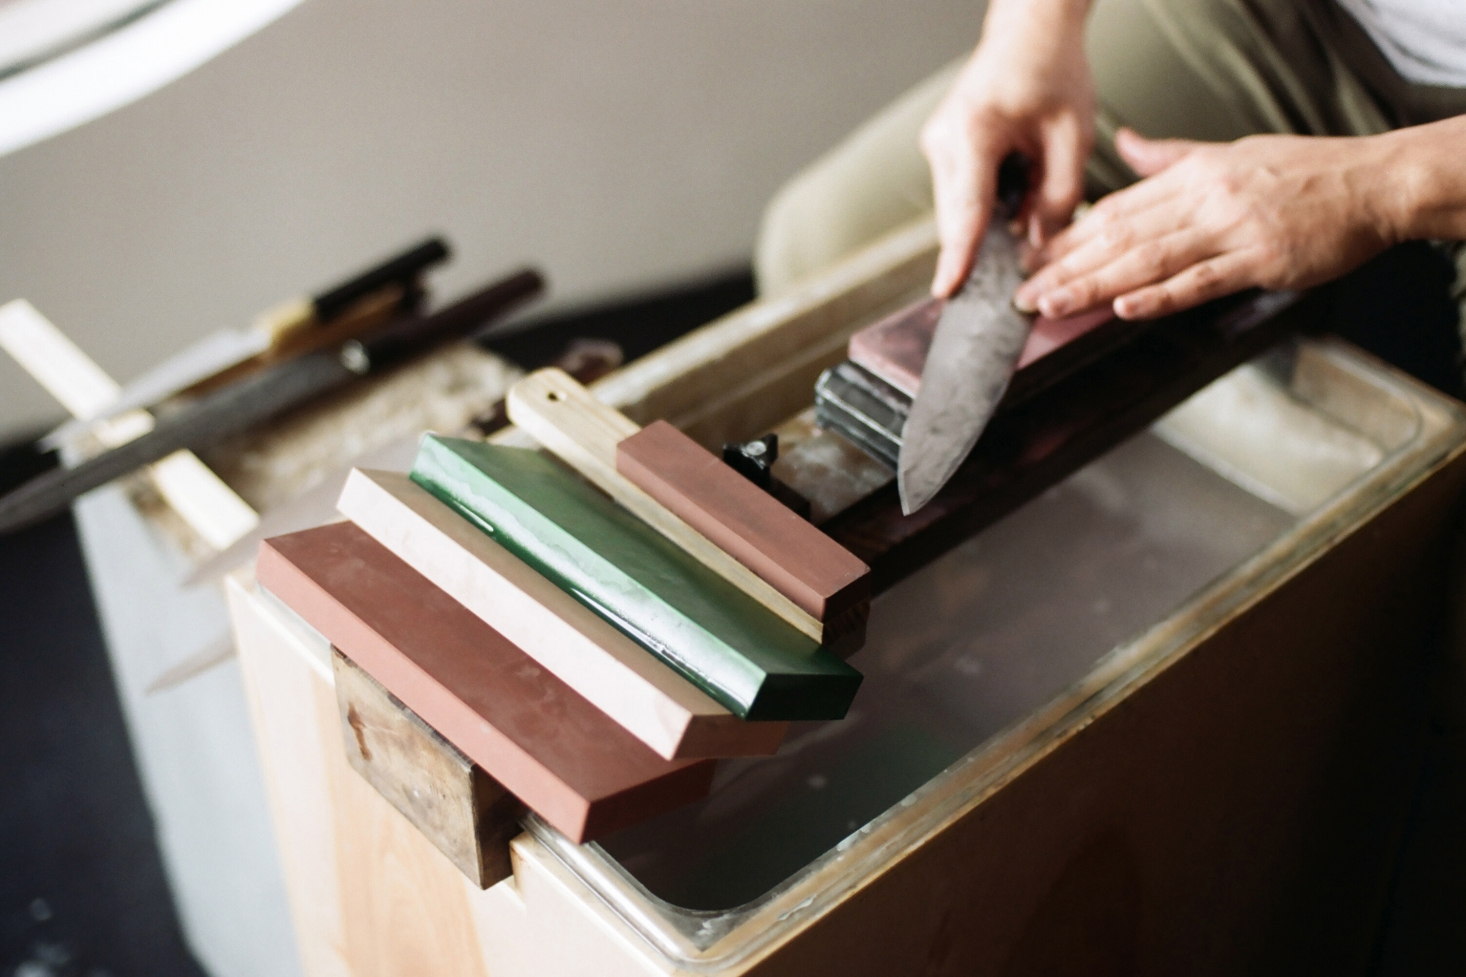 scott-scott-architects-ai-om-knives-making-knives-1466x977.jpg